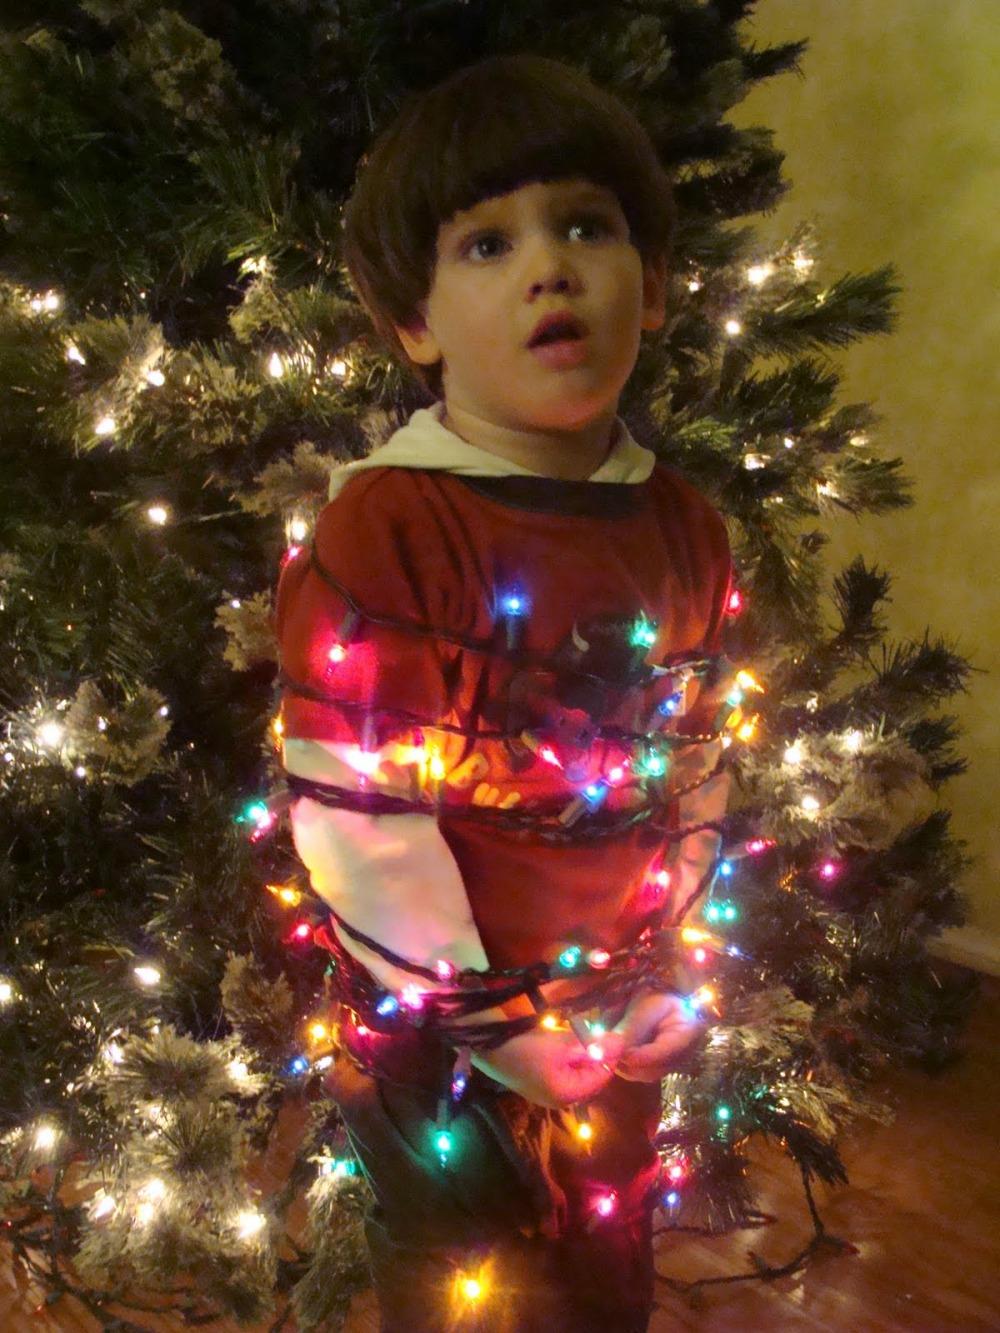 boy-wrapped-lights-awkward-holiday-photos